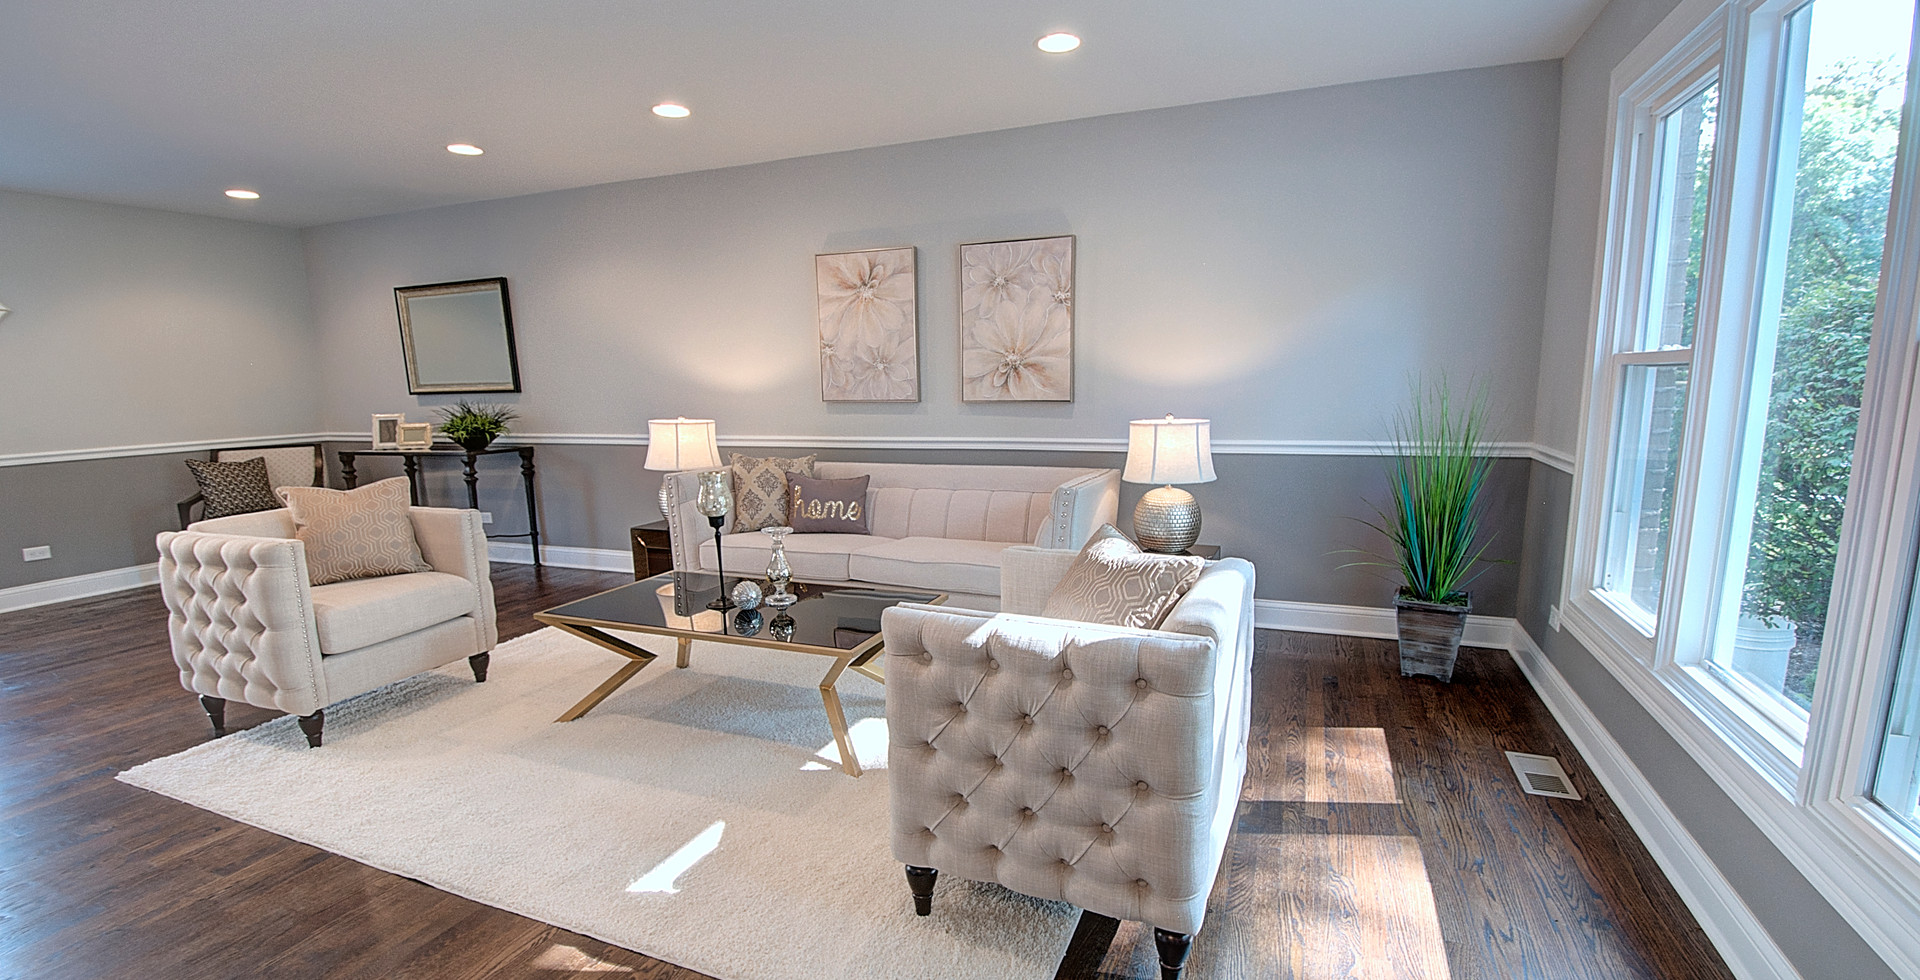 Living Room in Chicago designed by MRM Home Design.jpg